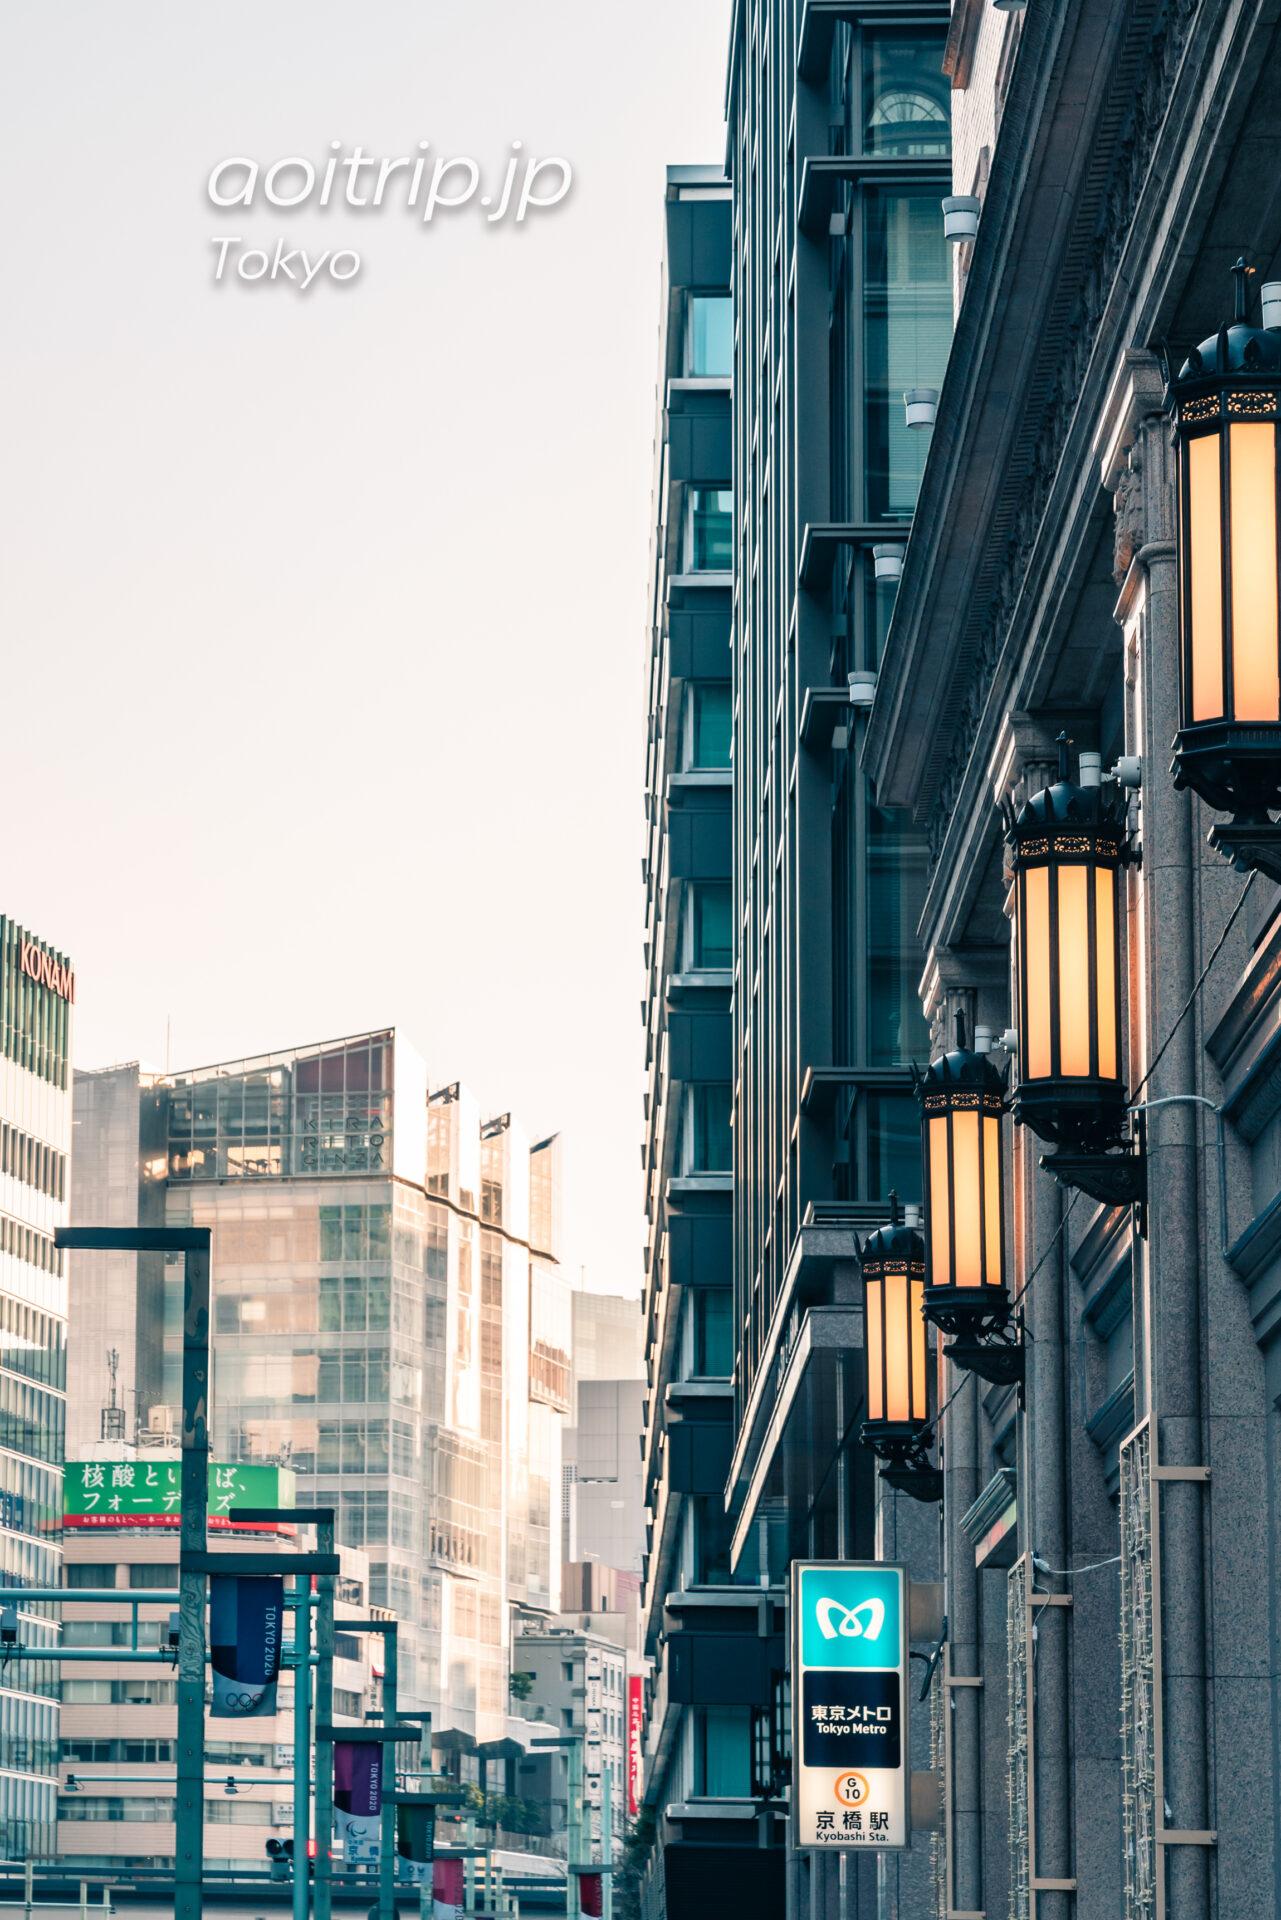 銀座中央通りと京橋駅